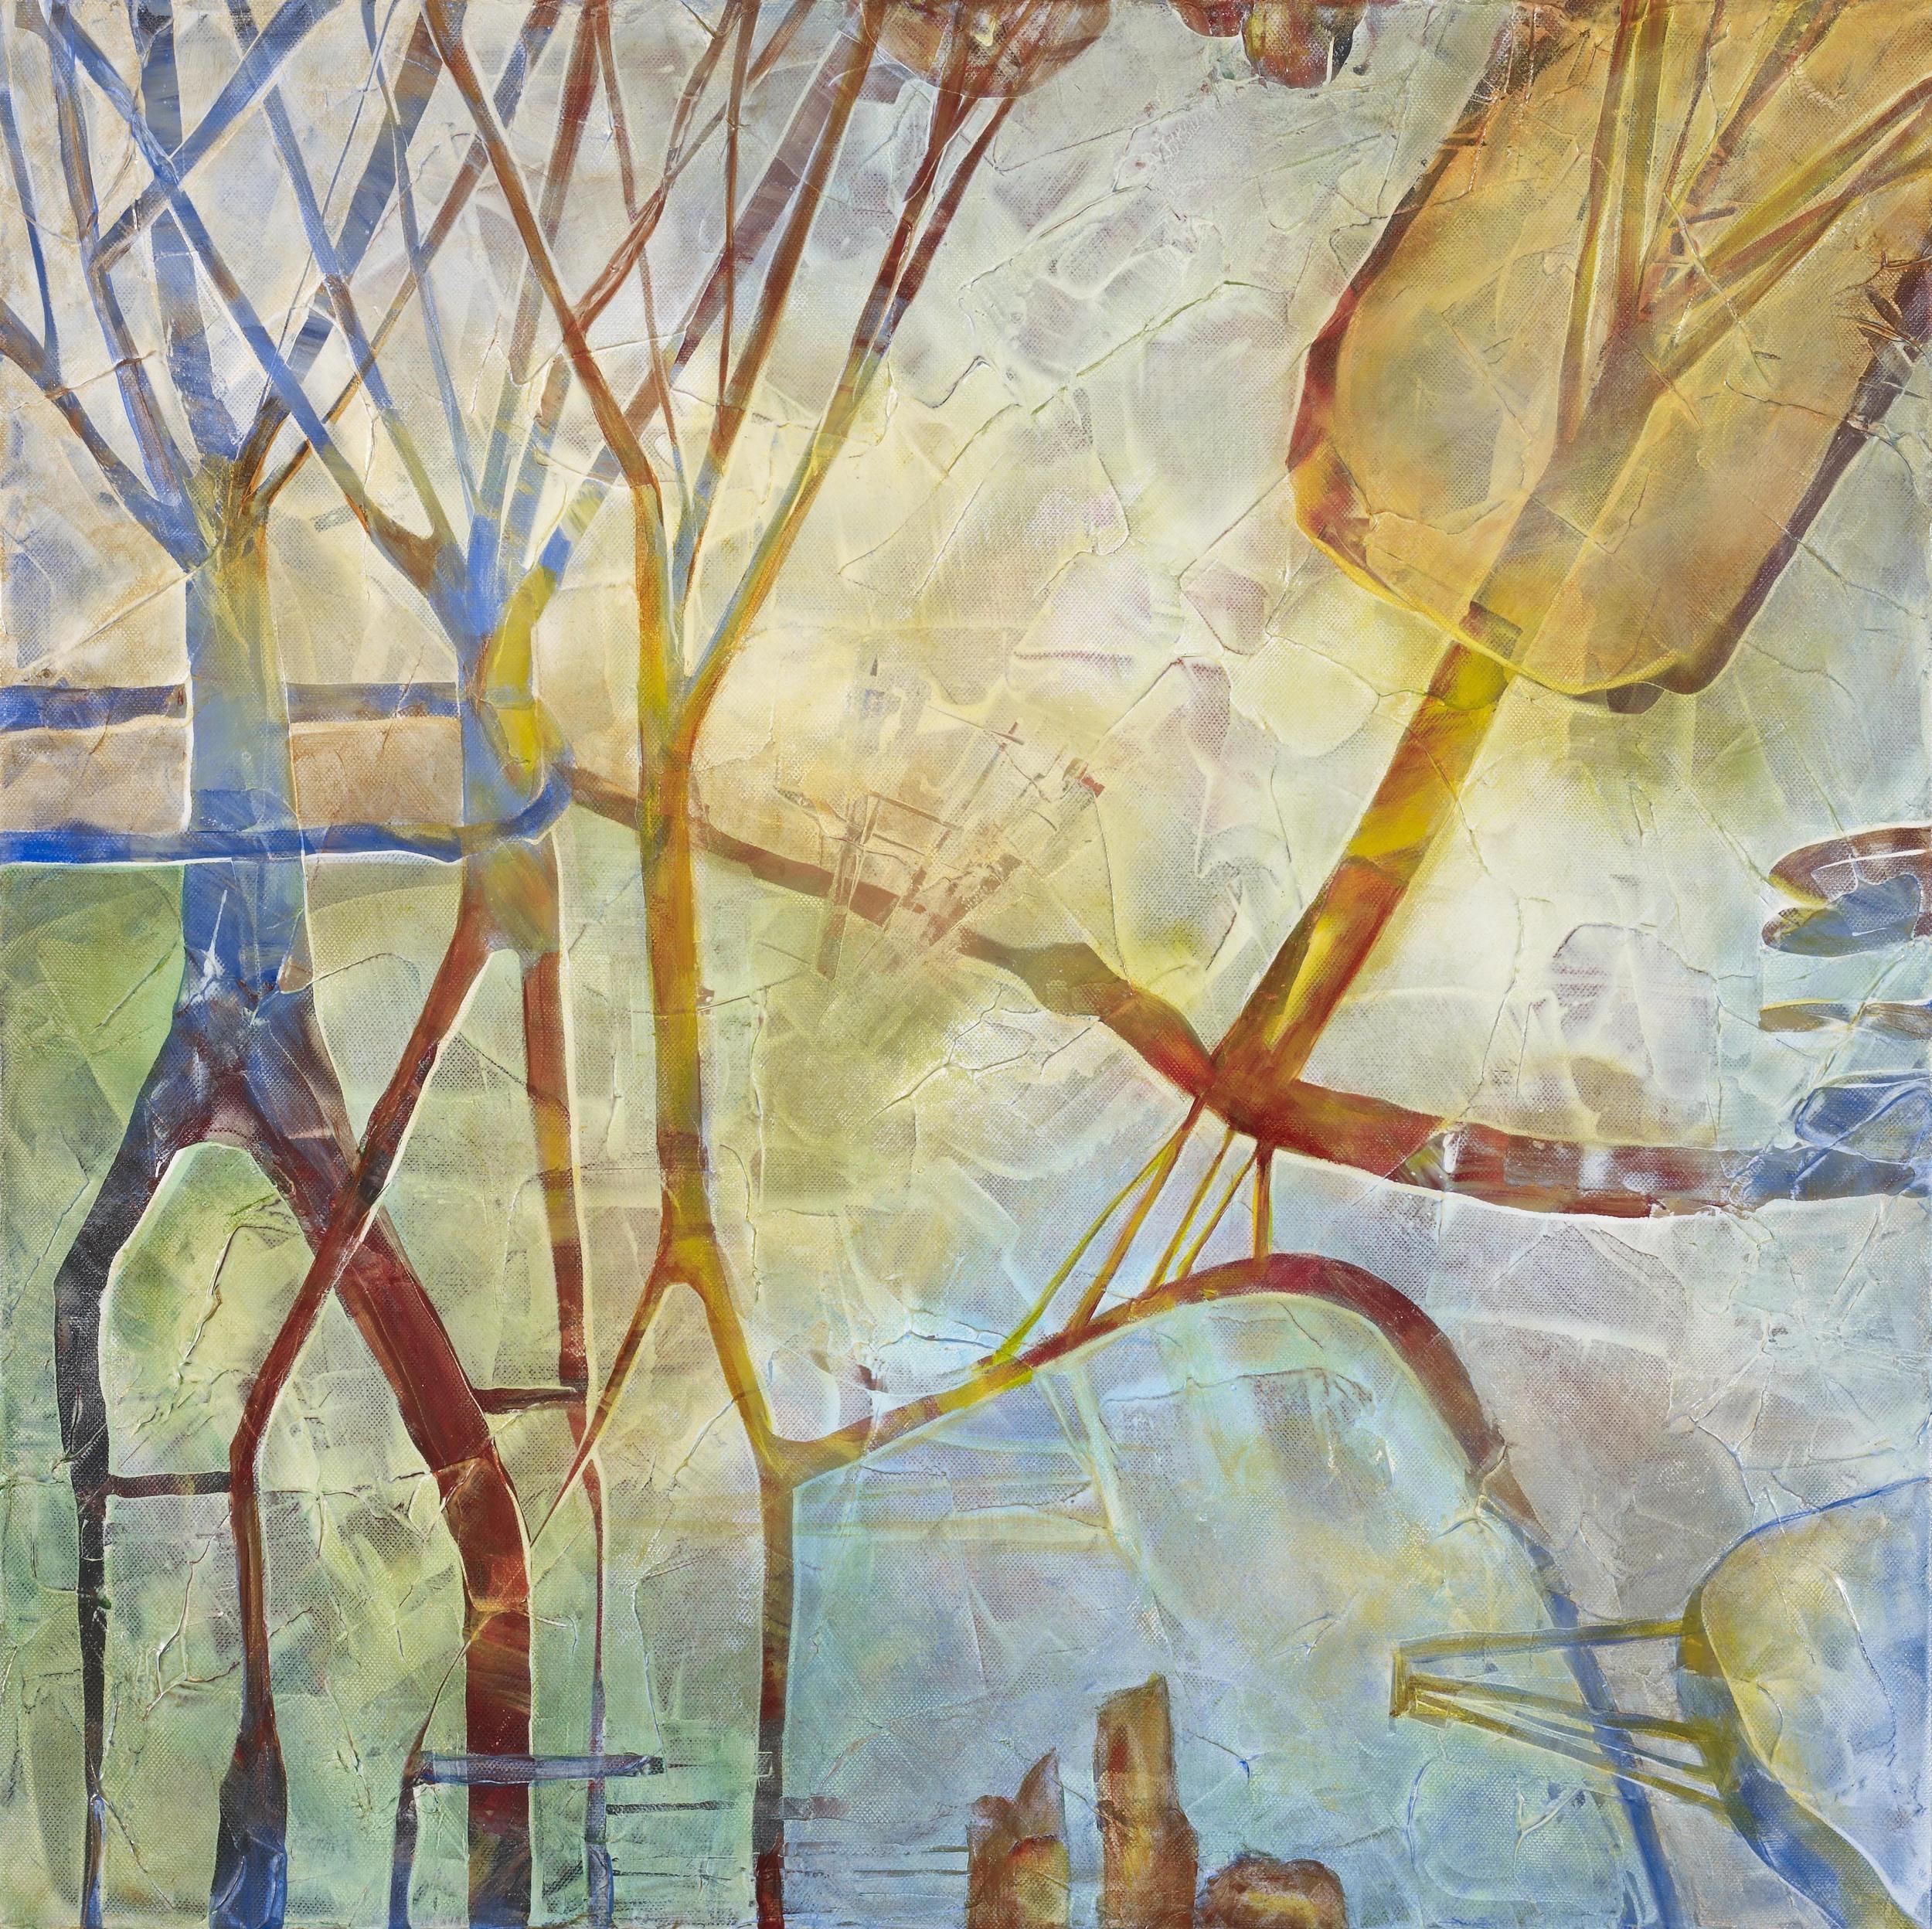 Environmental Abstracts